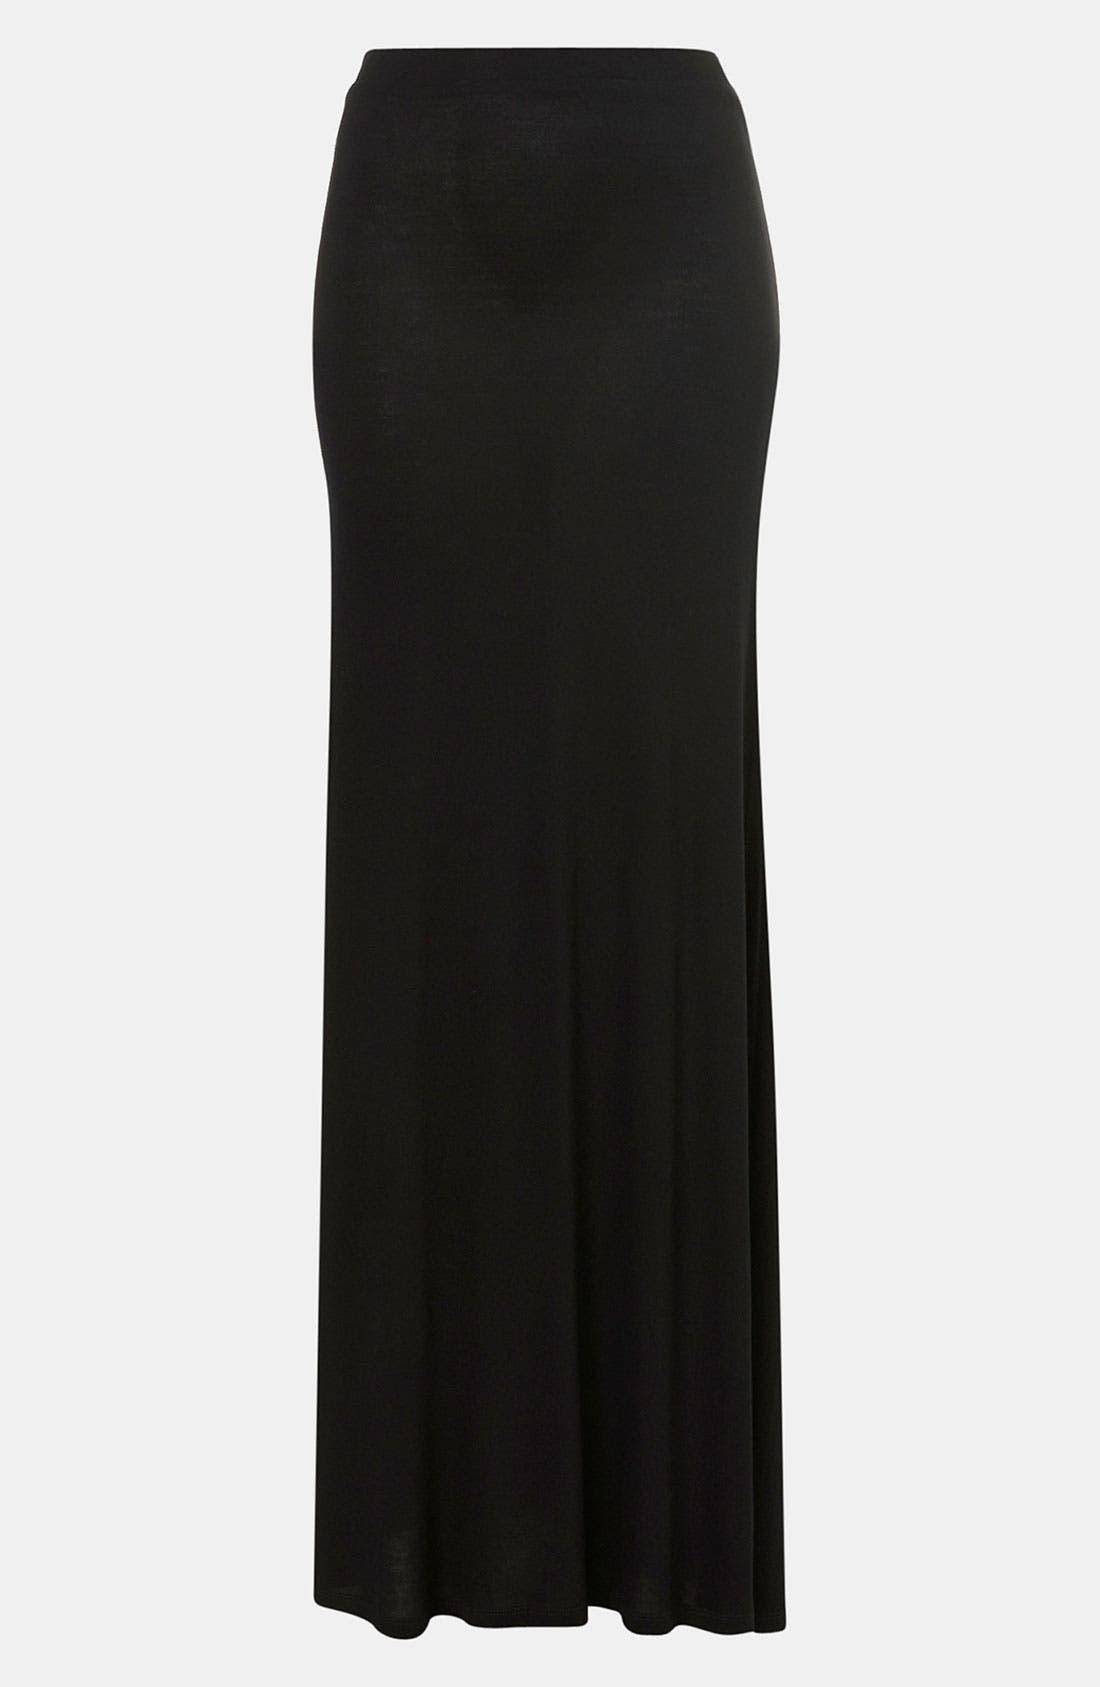 Alternate Image 1 Selected - Topshop Maxi Skirt